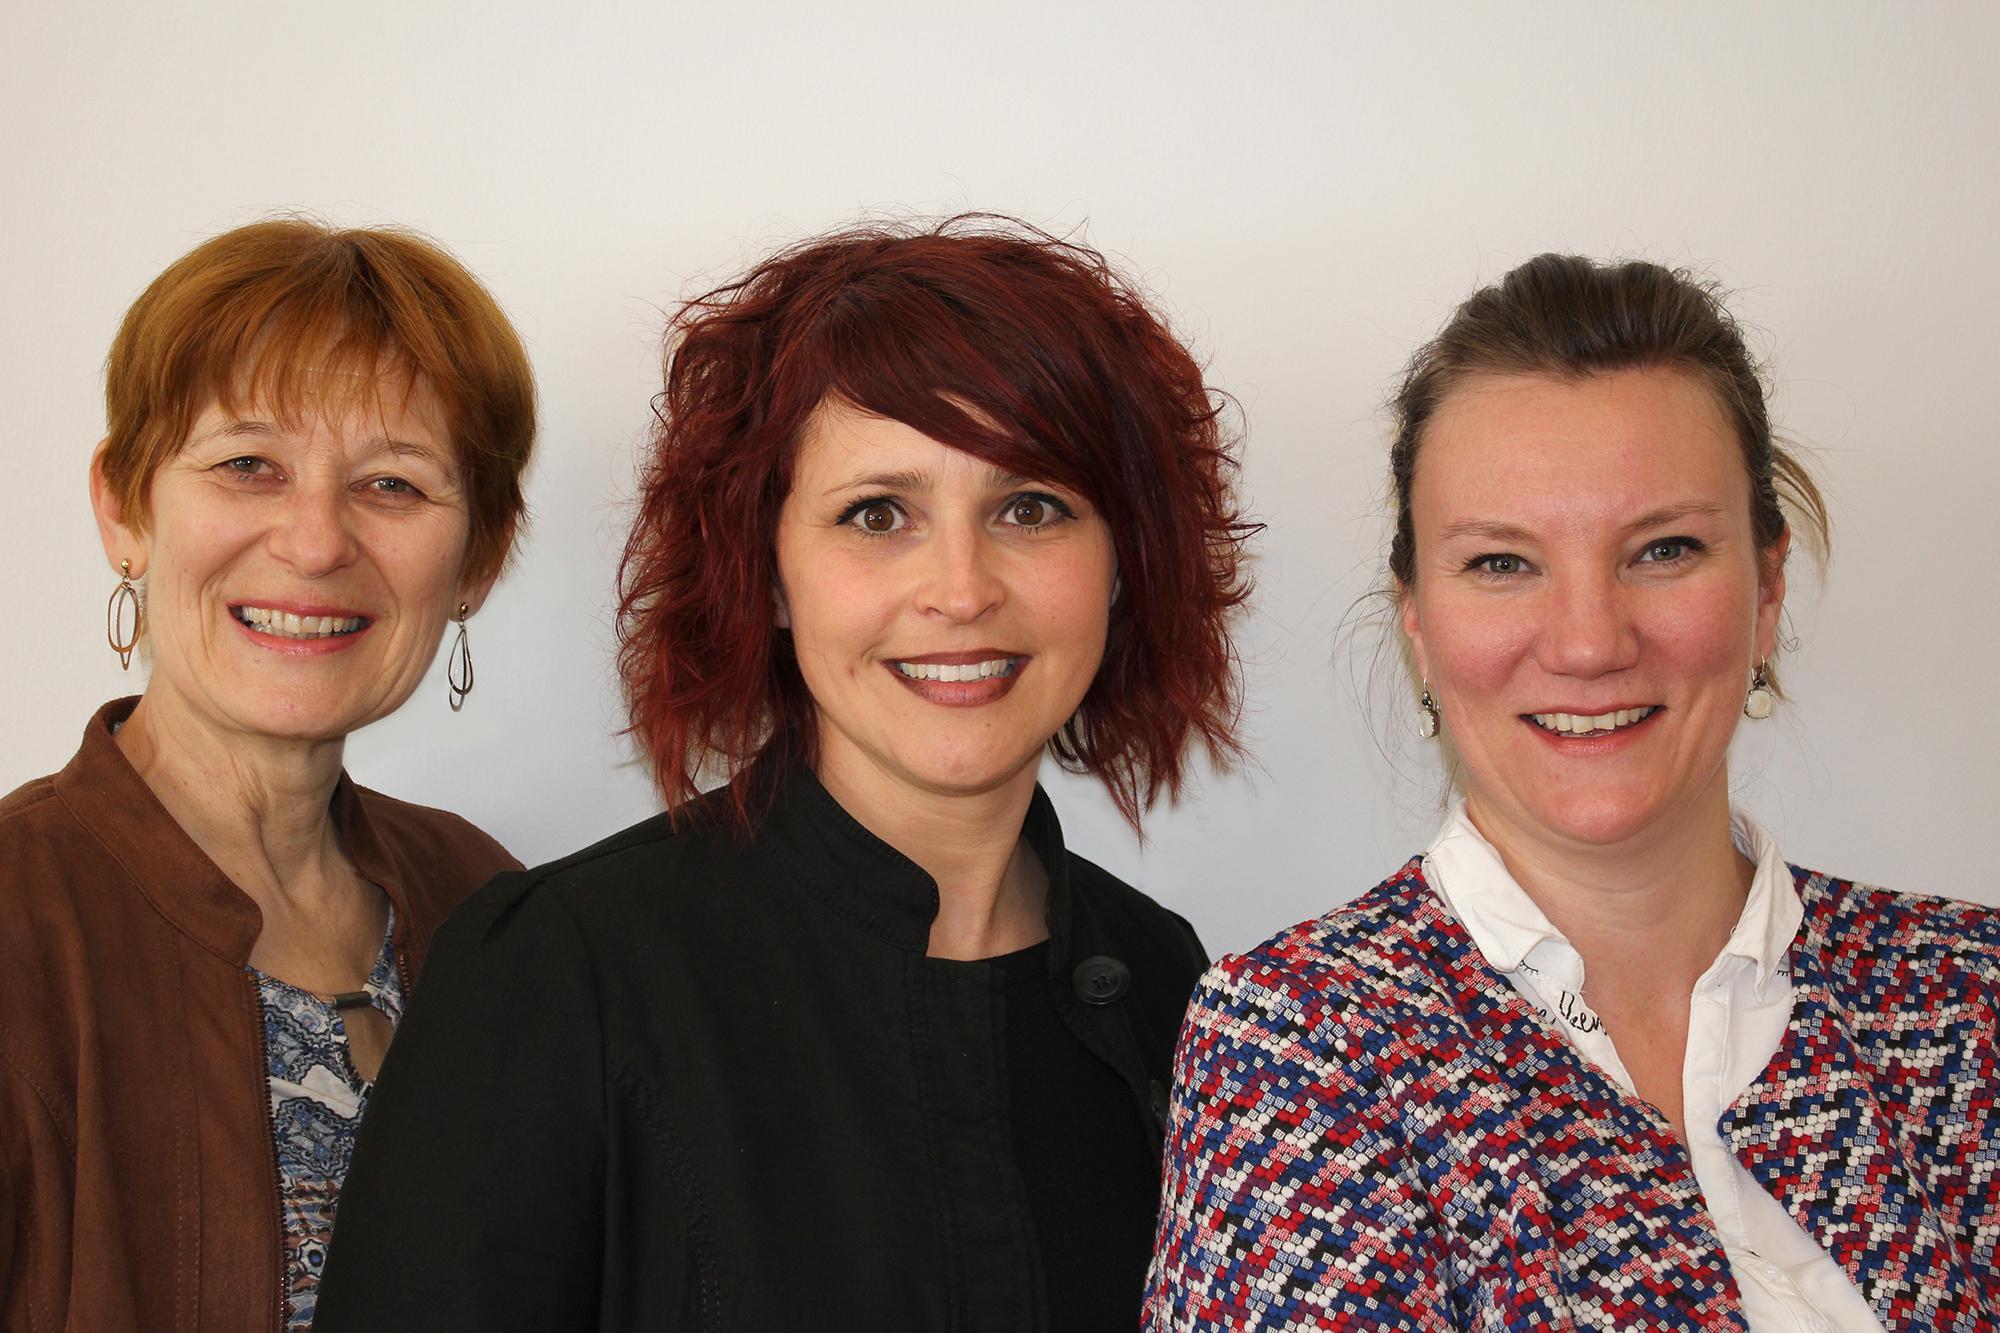 Foto: Team Familienbegleitung Leibnitz